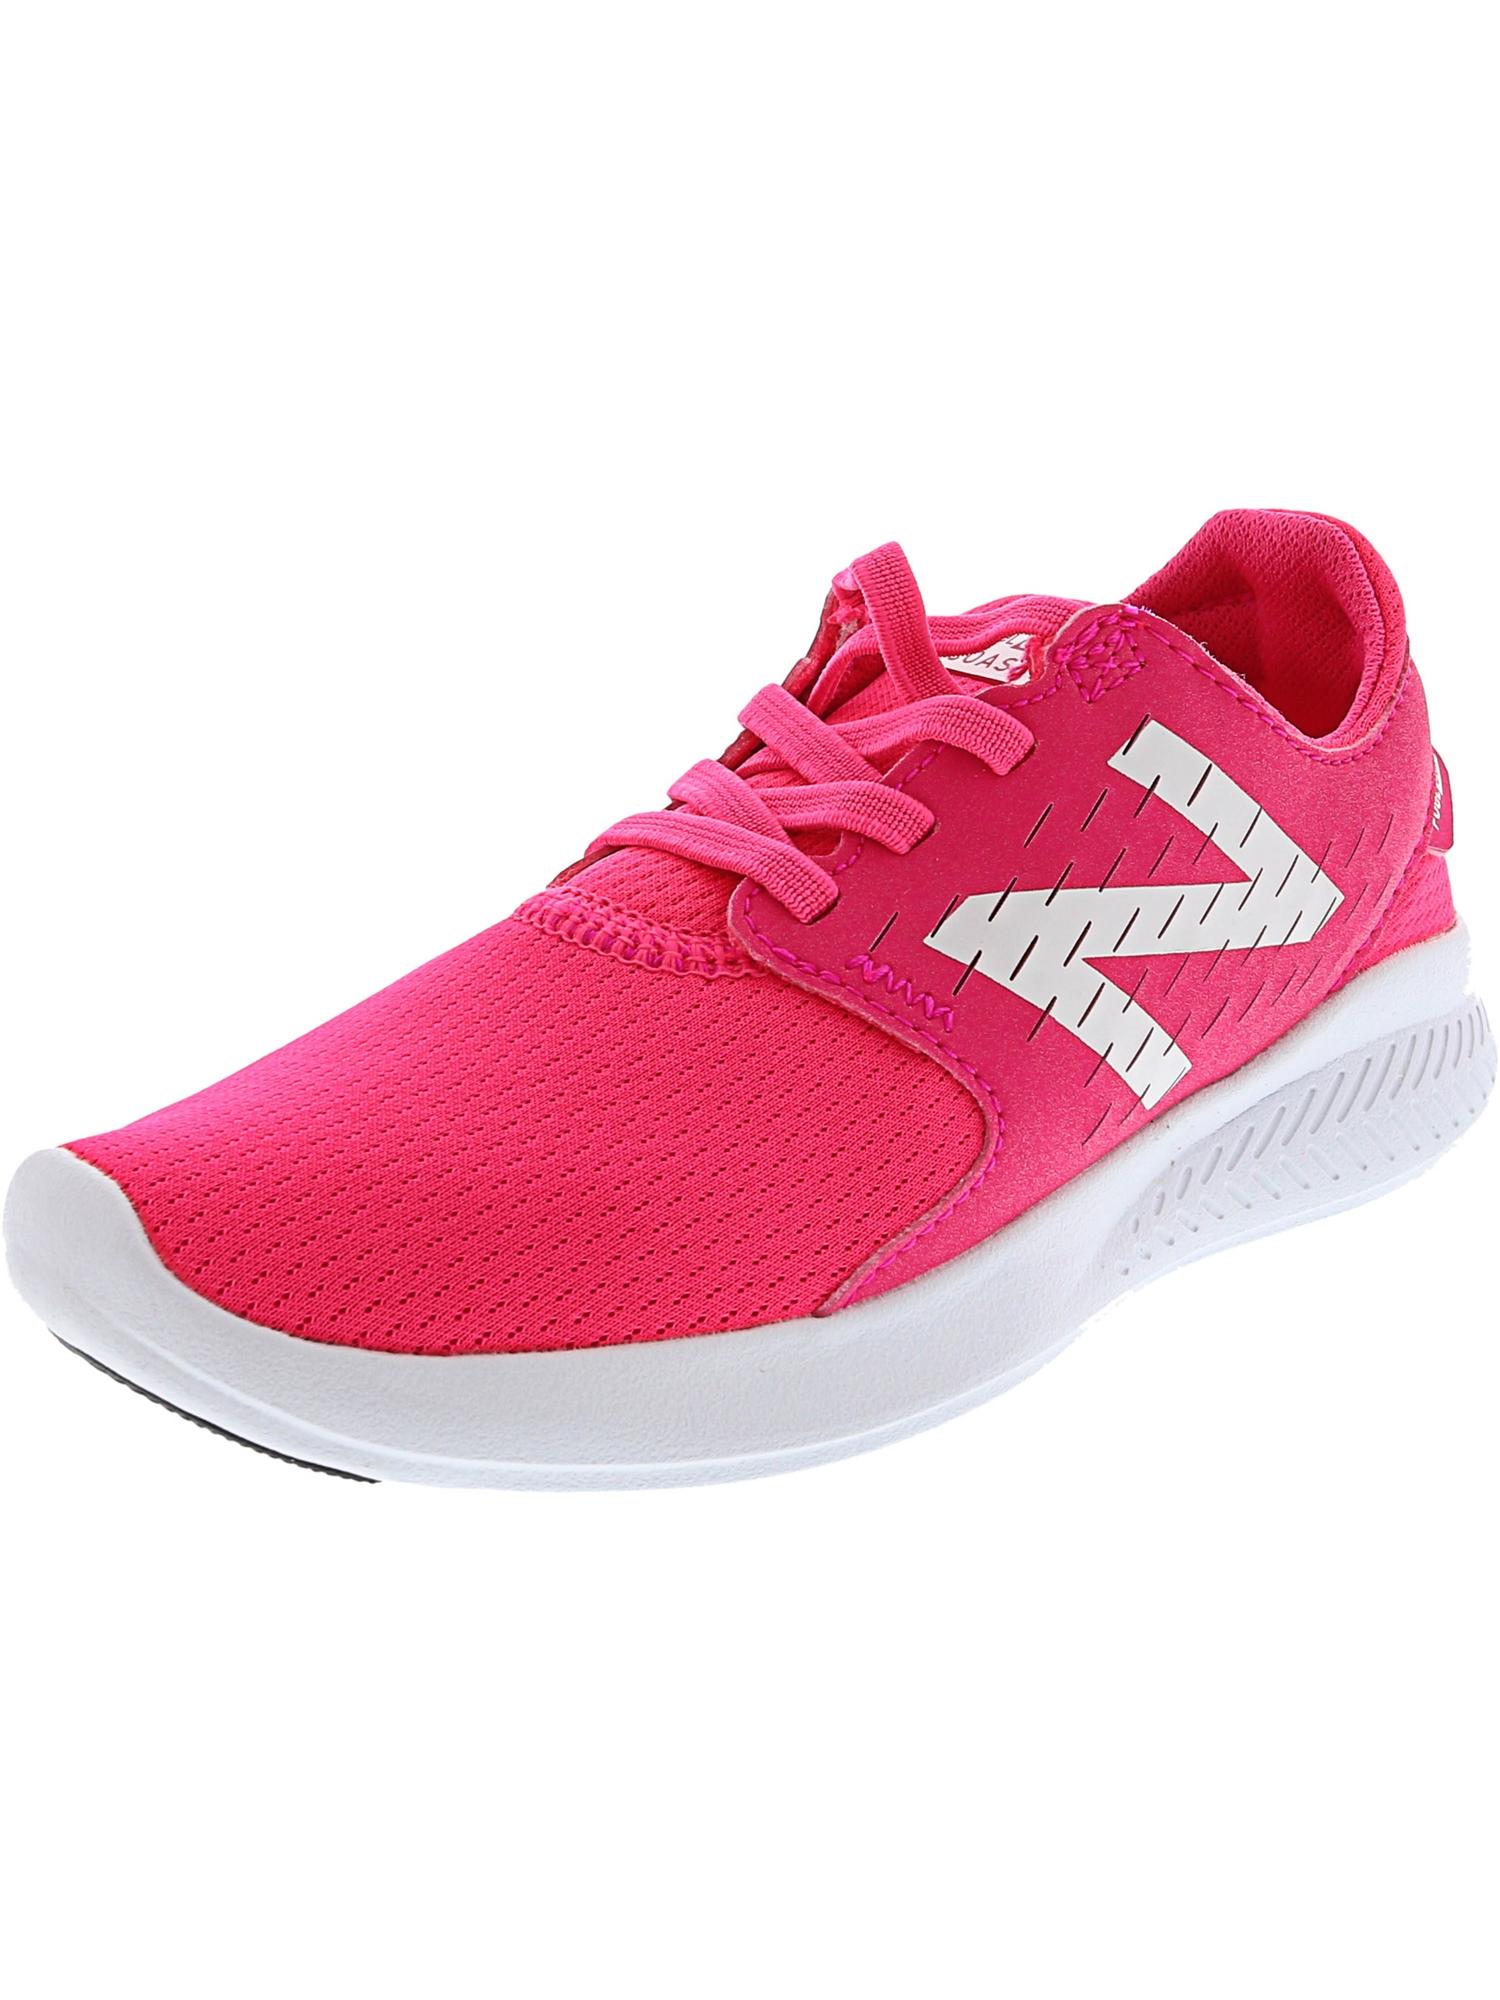 New Balance Kacst Qgi Ankle-High Fabric Fashion Sneaker - 3W